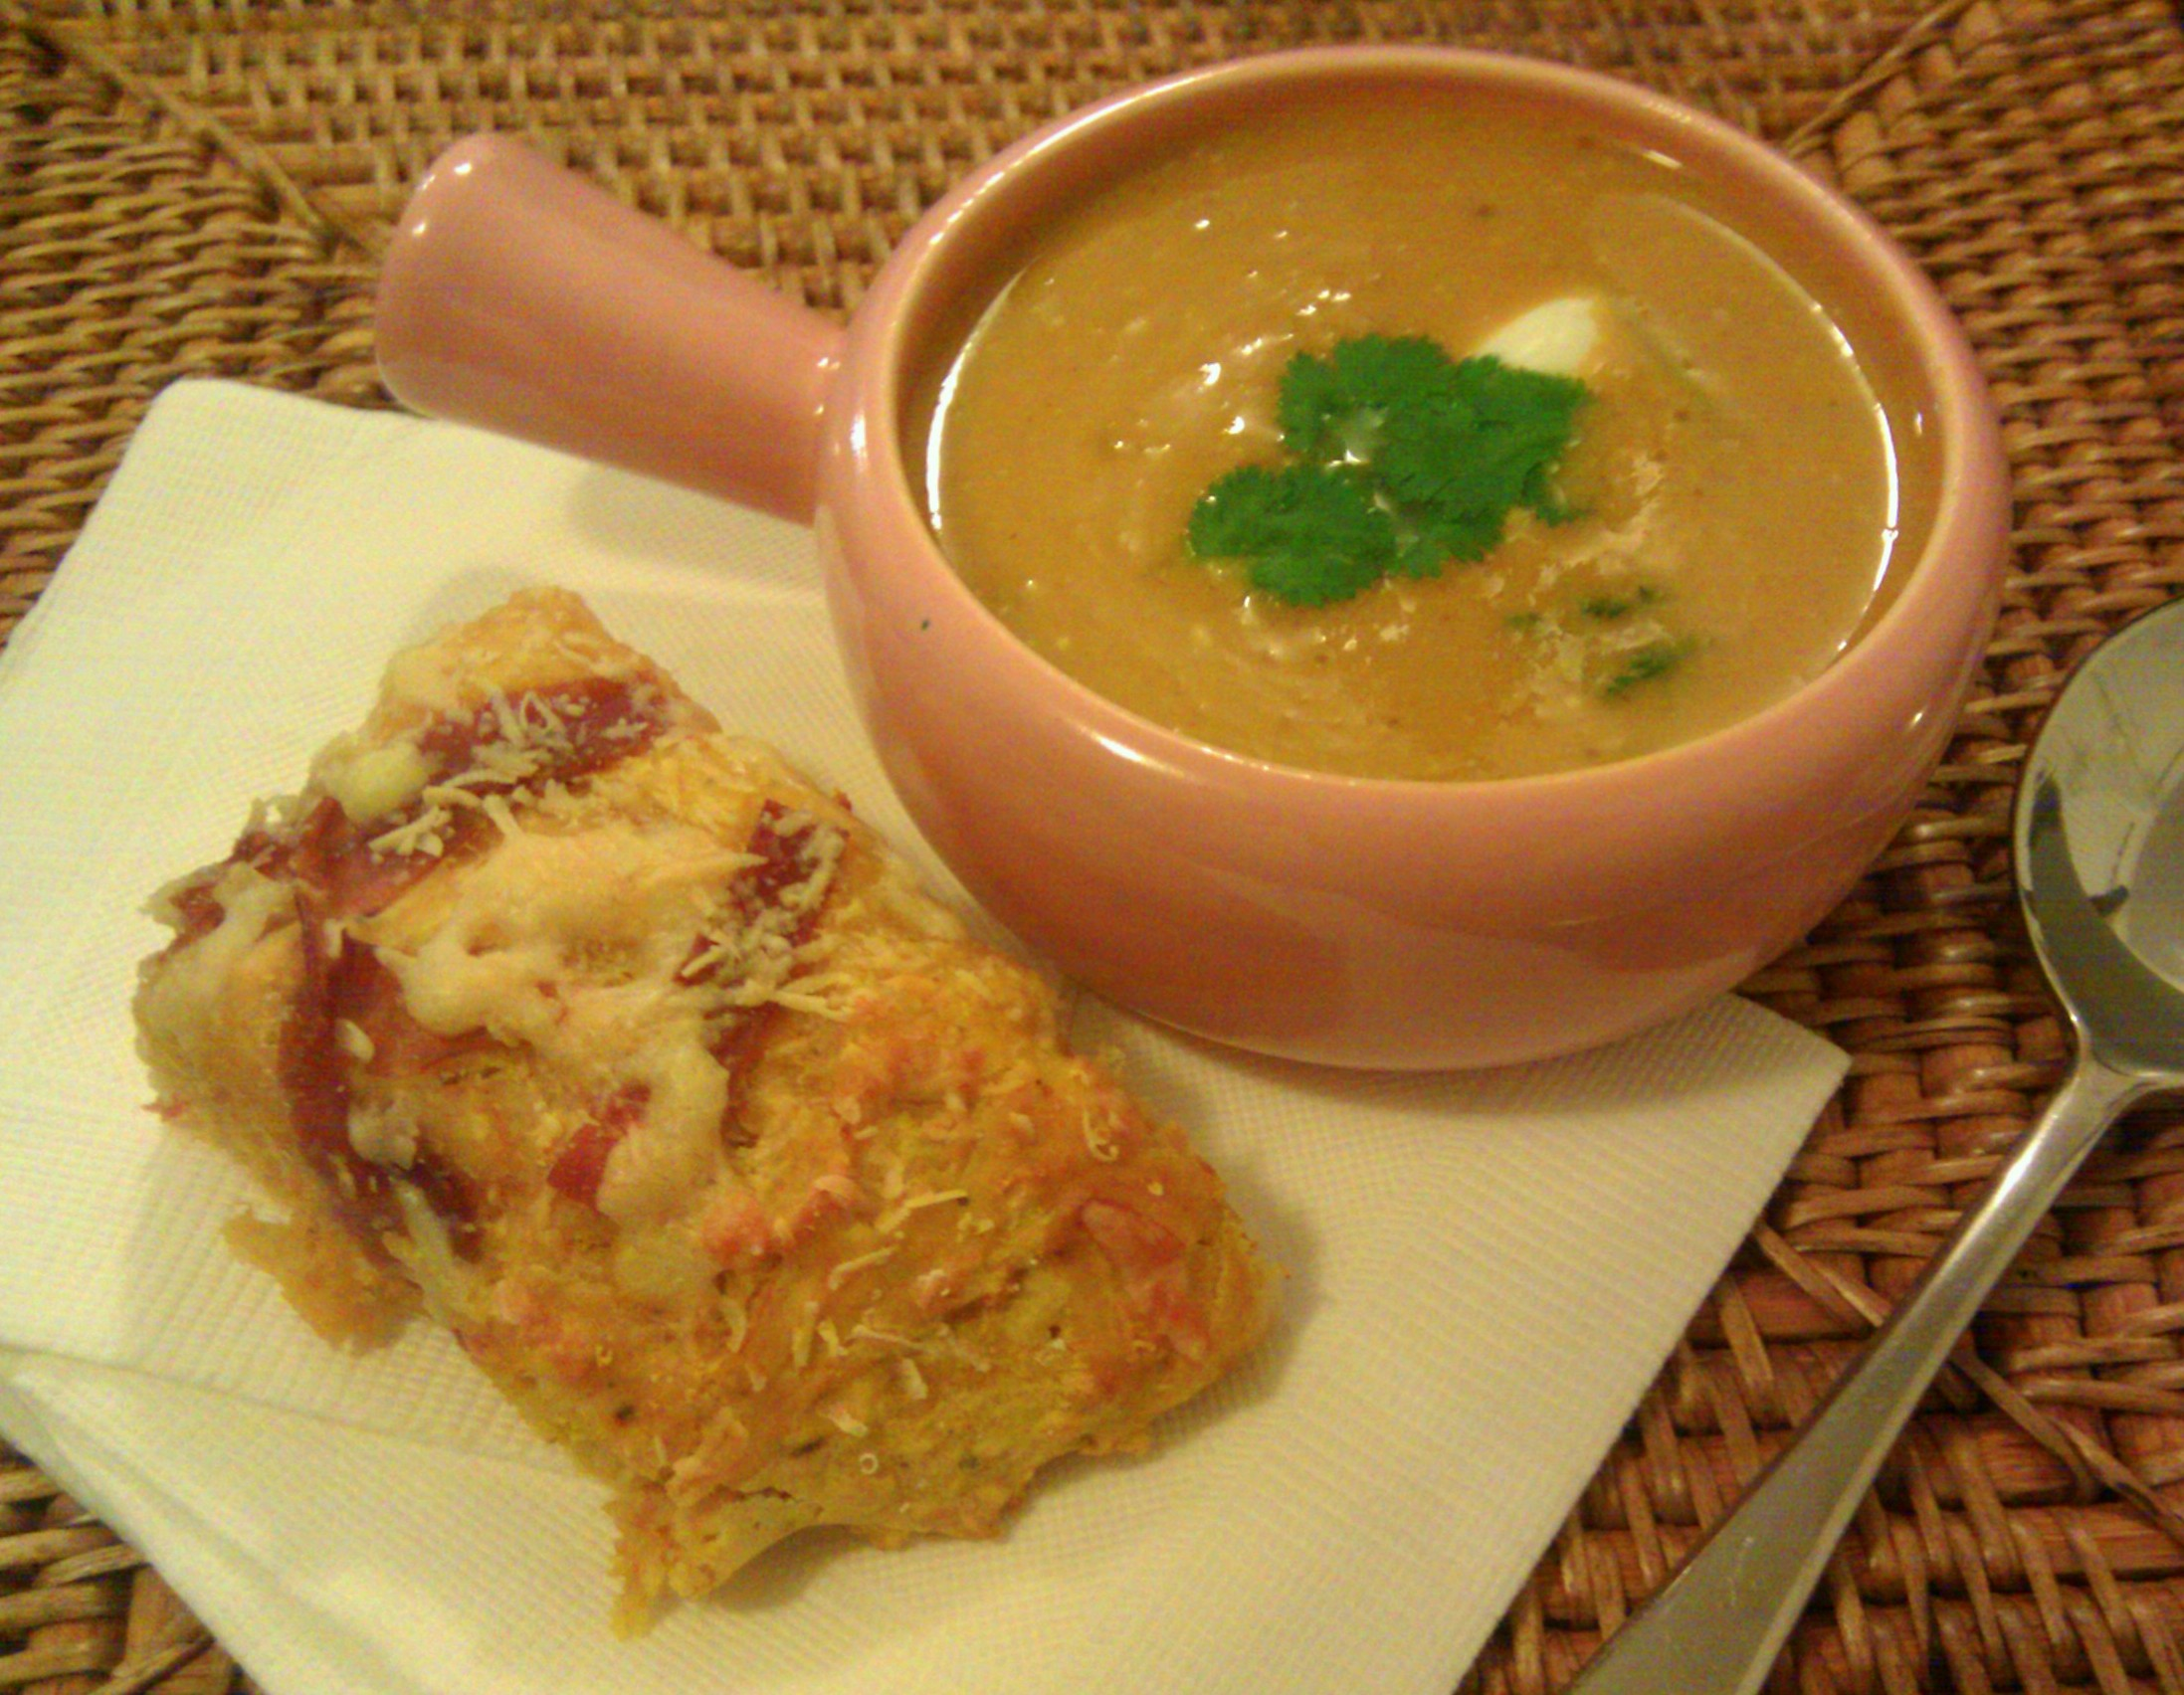 Pumpkin Soup with Savoury Pumpkin Scones - Heike Herrling